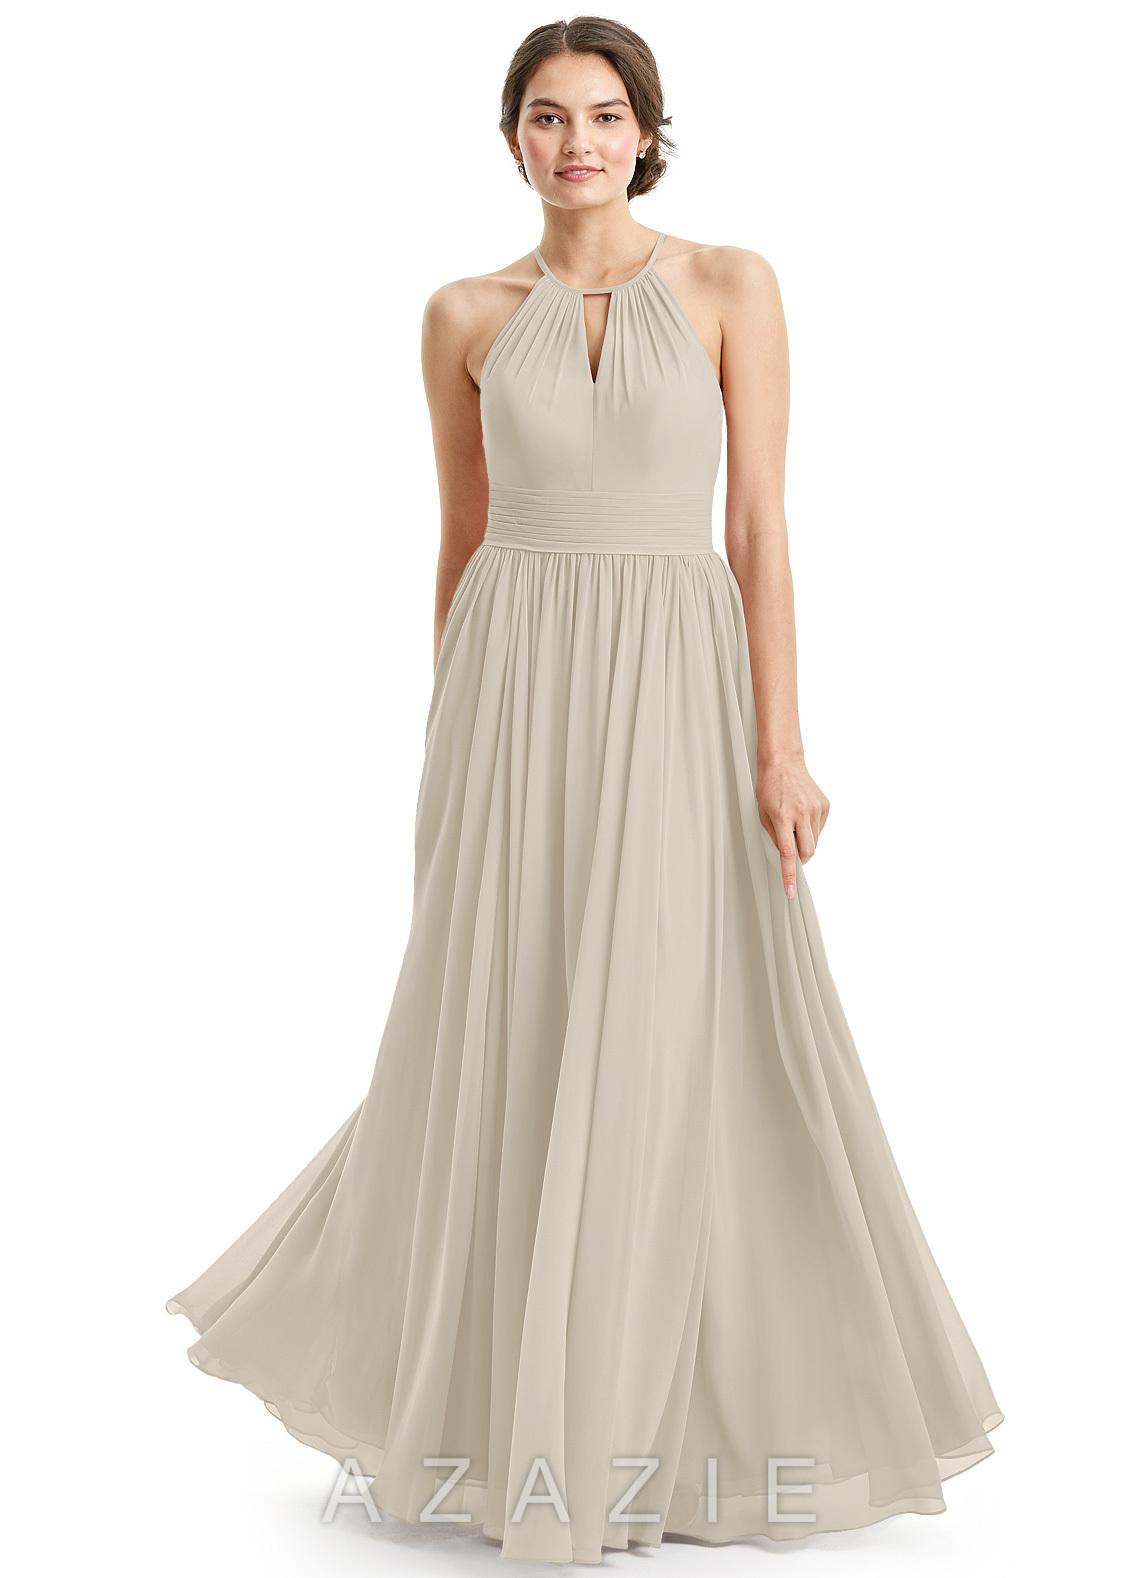 Azazie cherish bridesmaid dress azazie color taupe ombrellifo Image collections